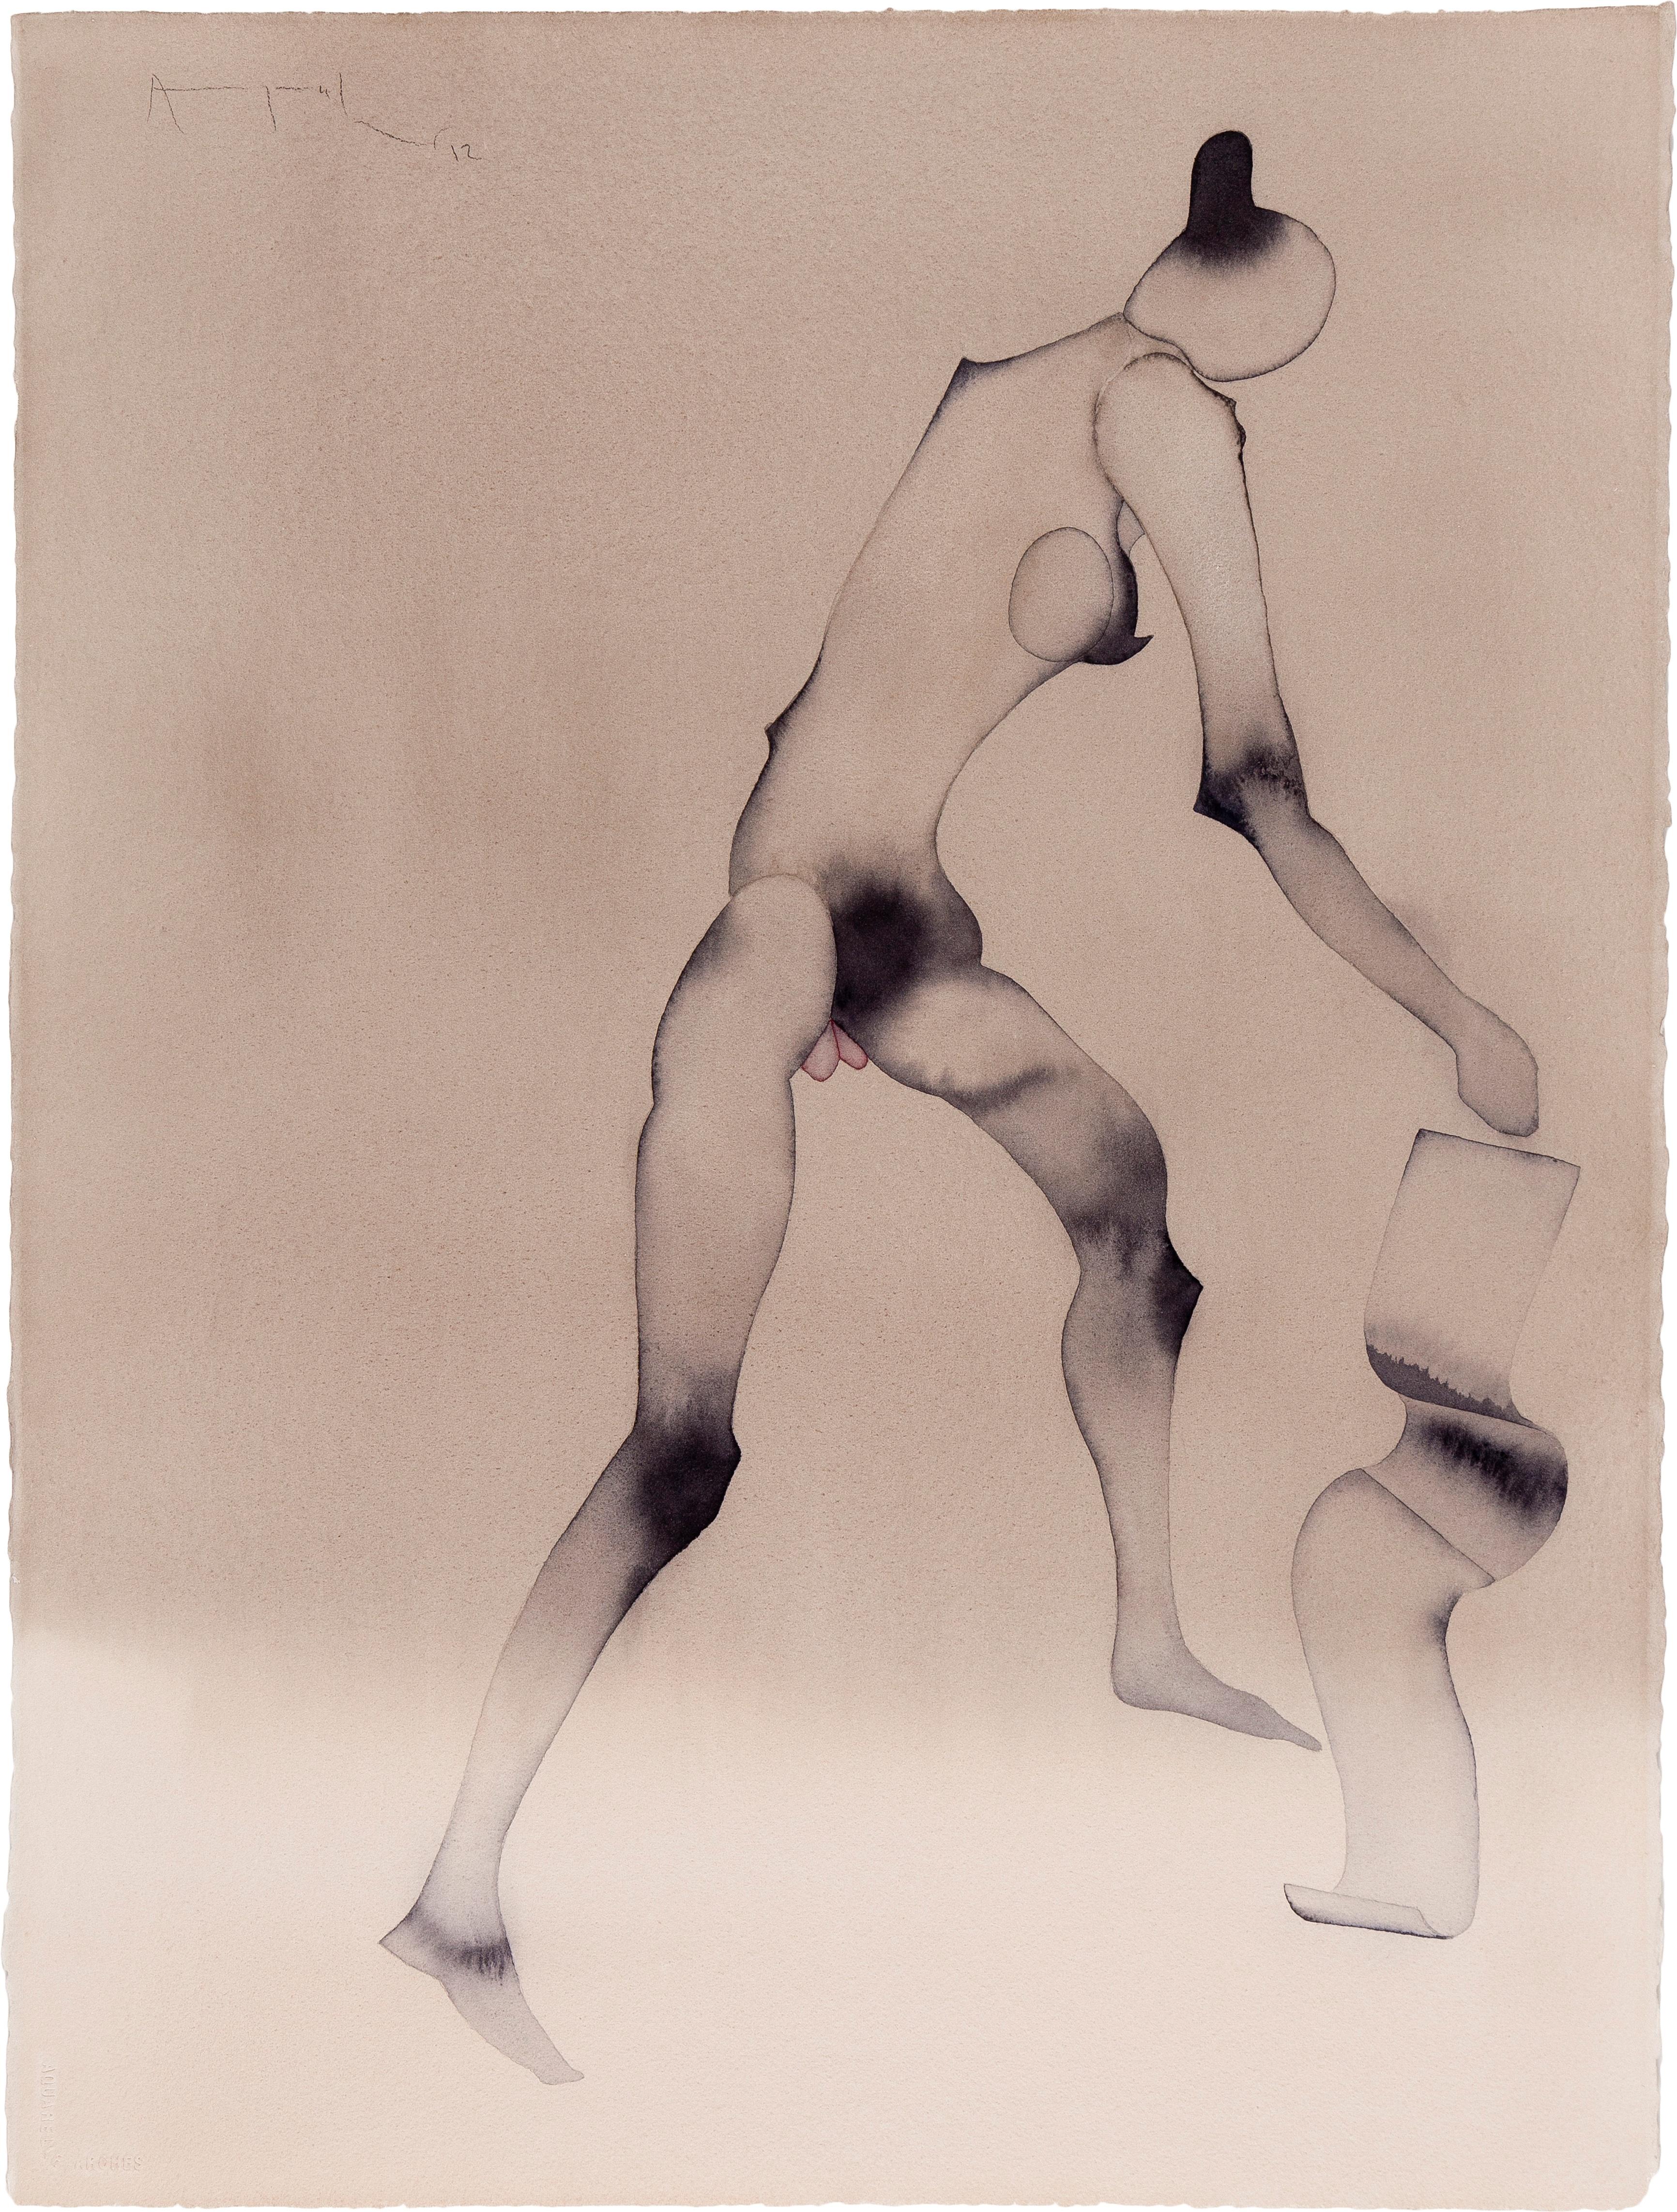 Atul Dodiya Falling Scroll, 2012 Aquarelle sur papier En vente chez Paddle8